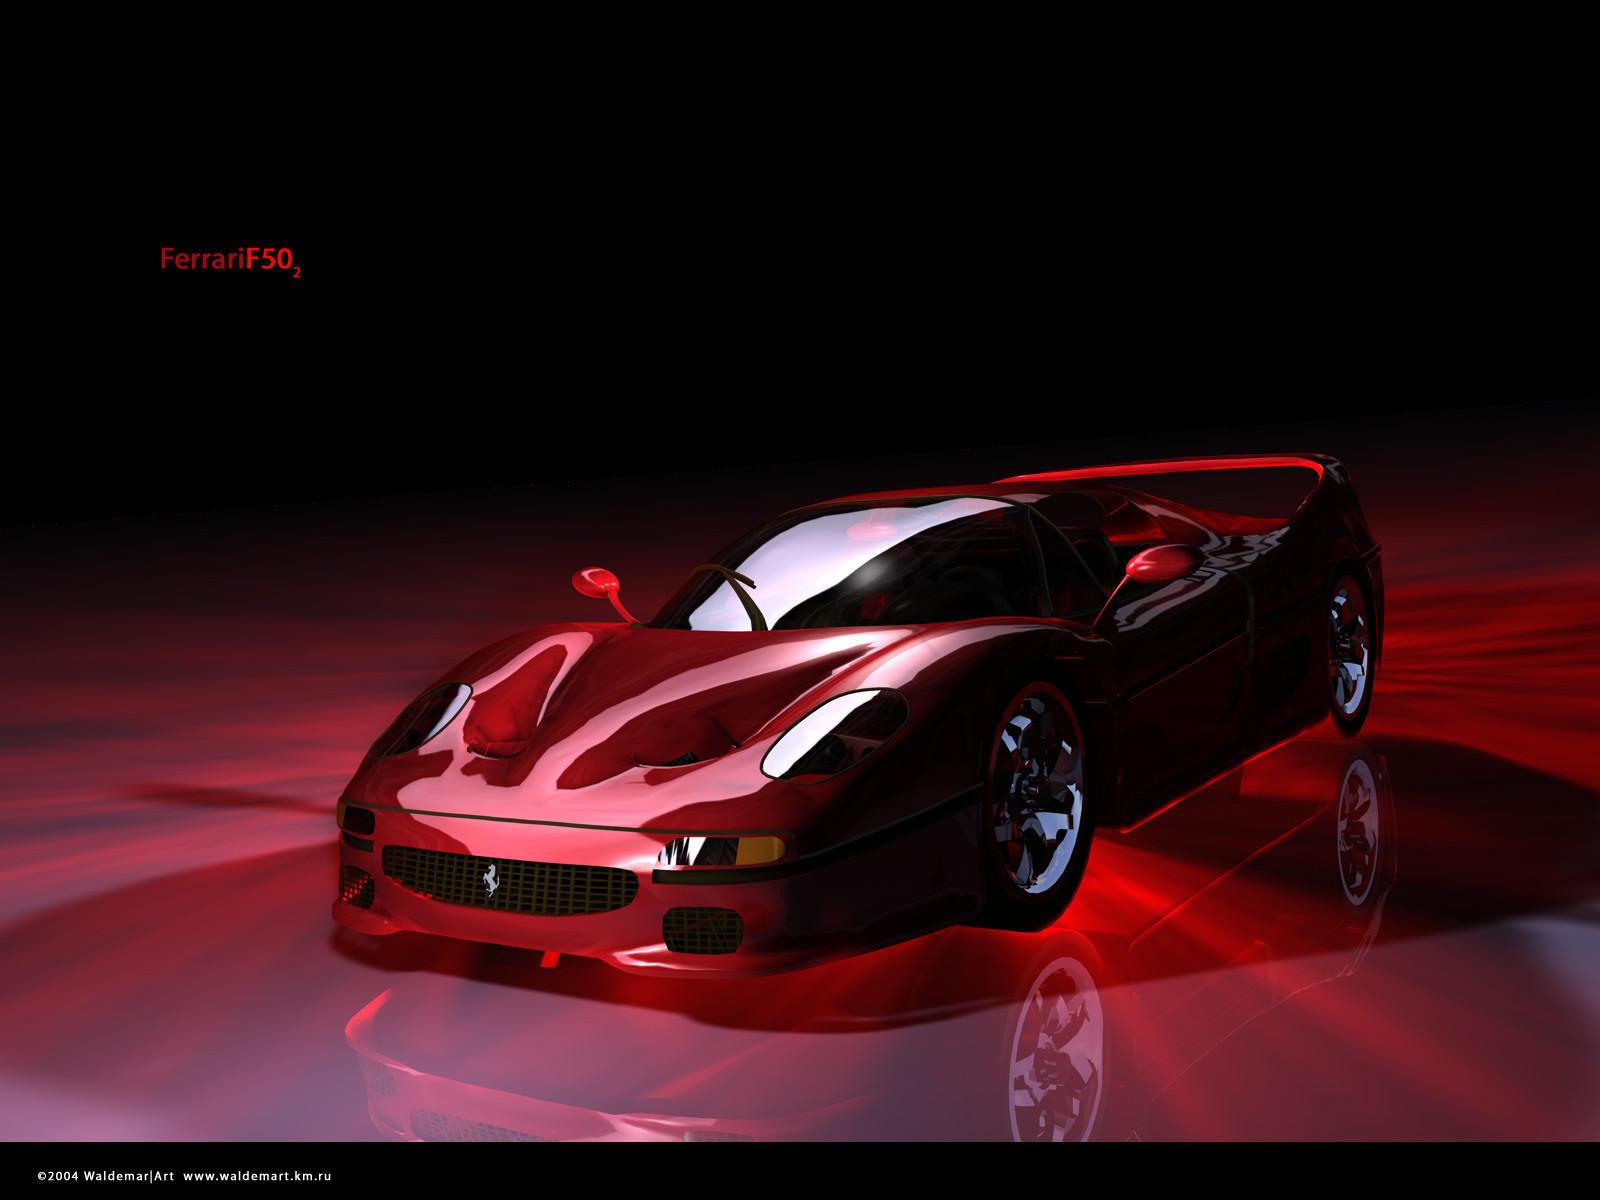 Ferrari F50 by waldemarart